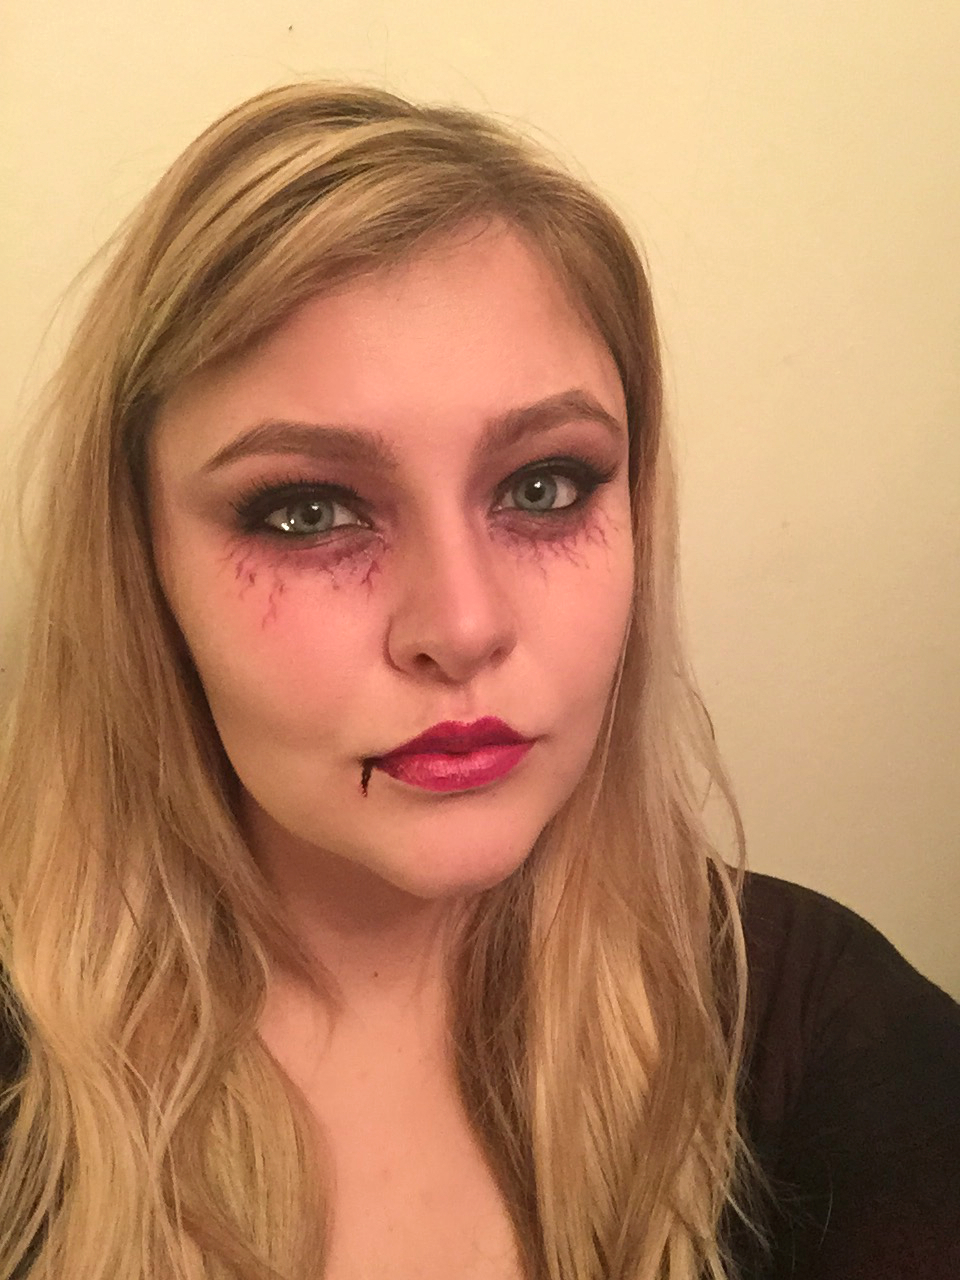 Glam vampire tutorial simple halloween makeup 3 bristolian beauty glam vampire tutorial simple halloween makeup 3 baditri Image collections